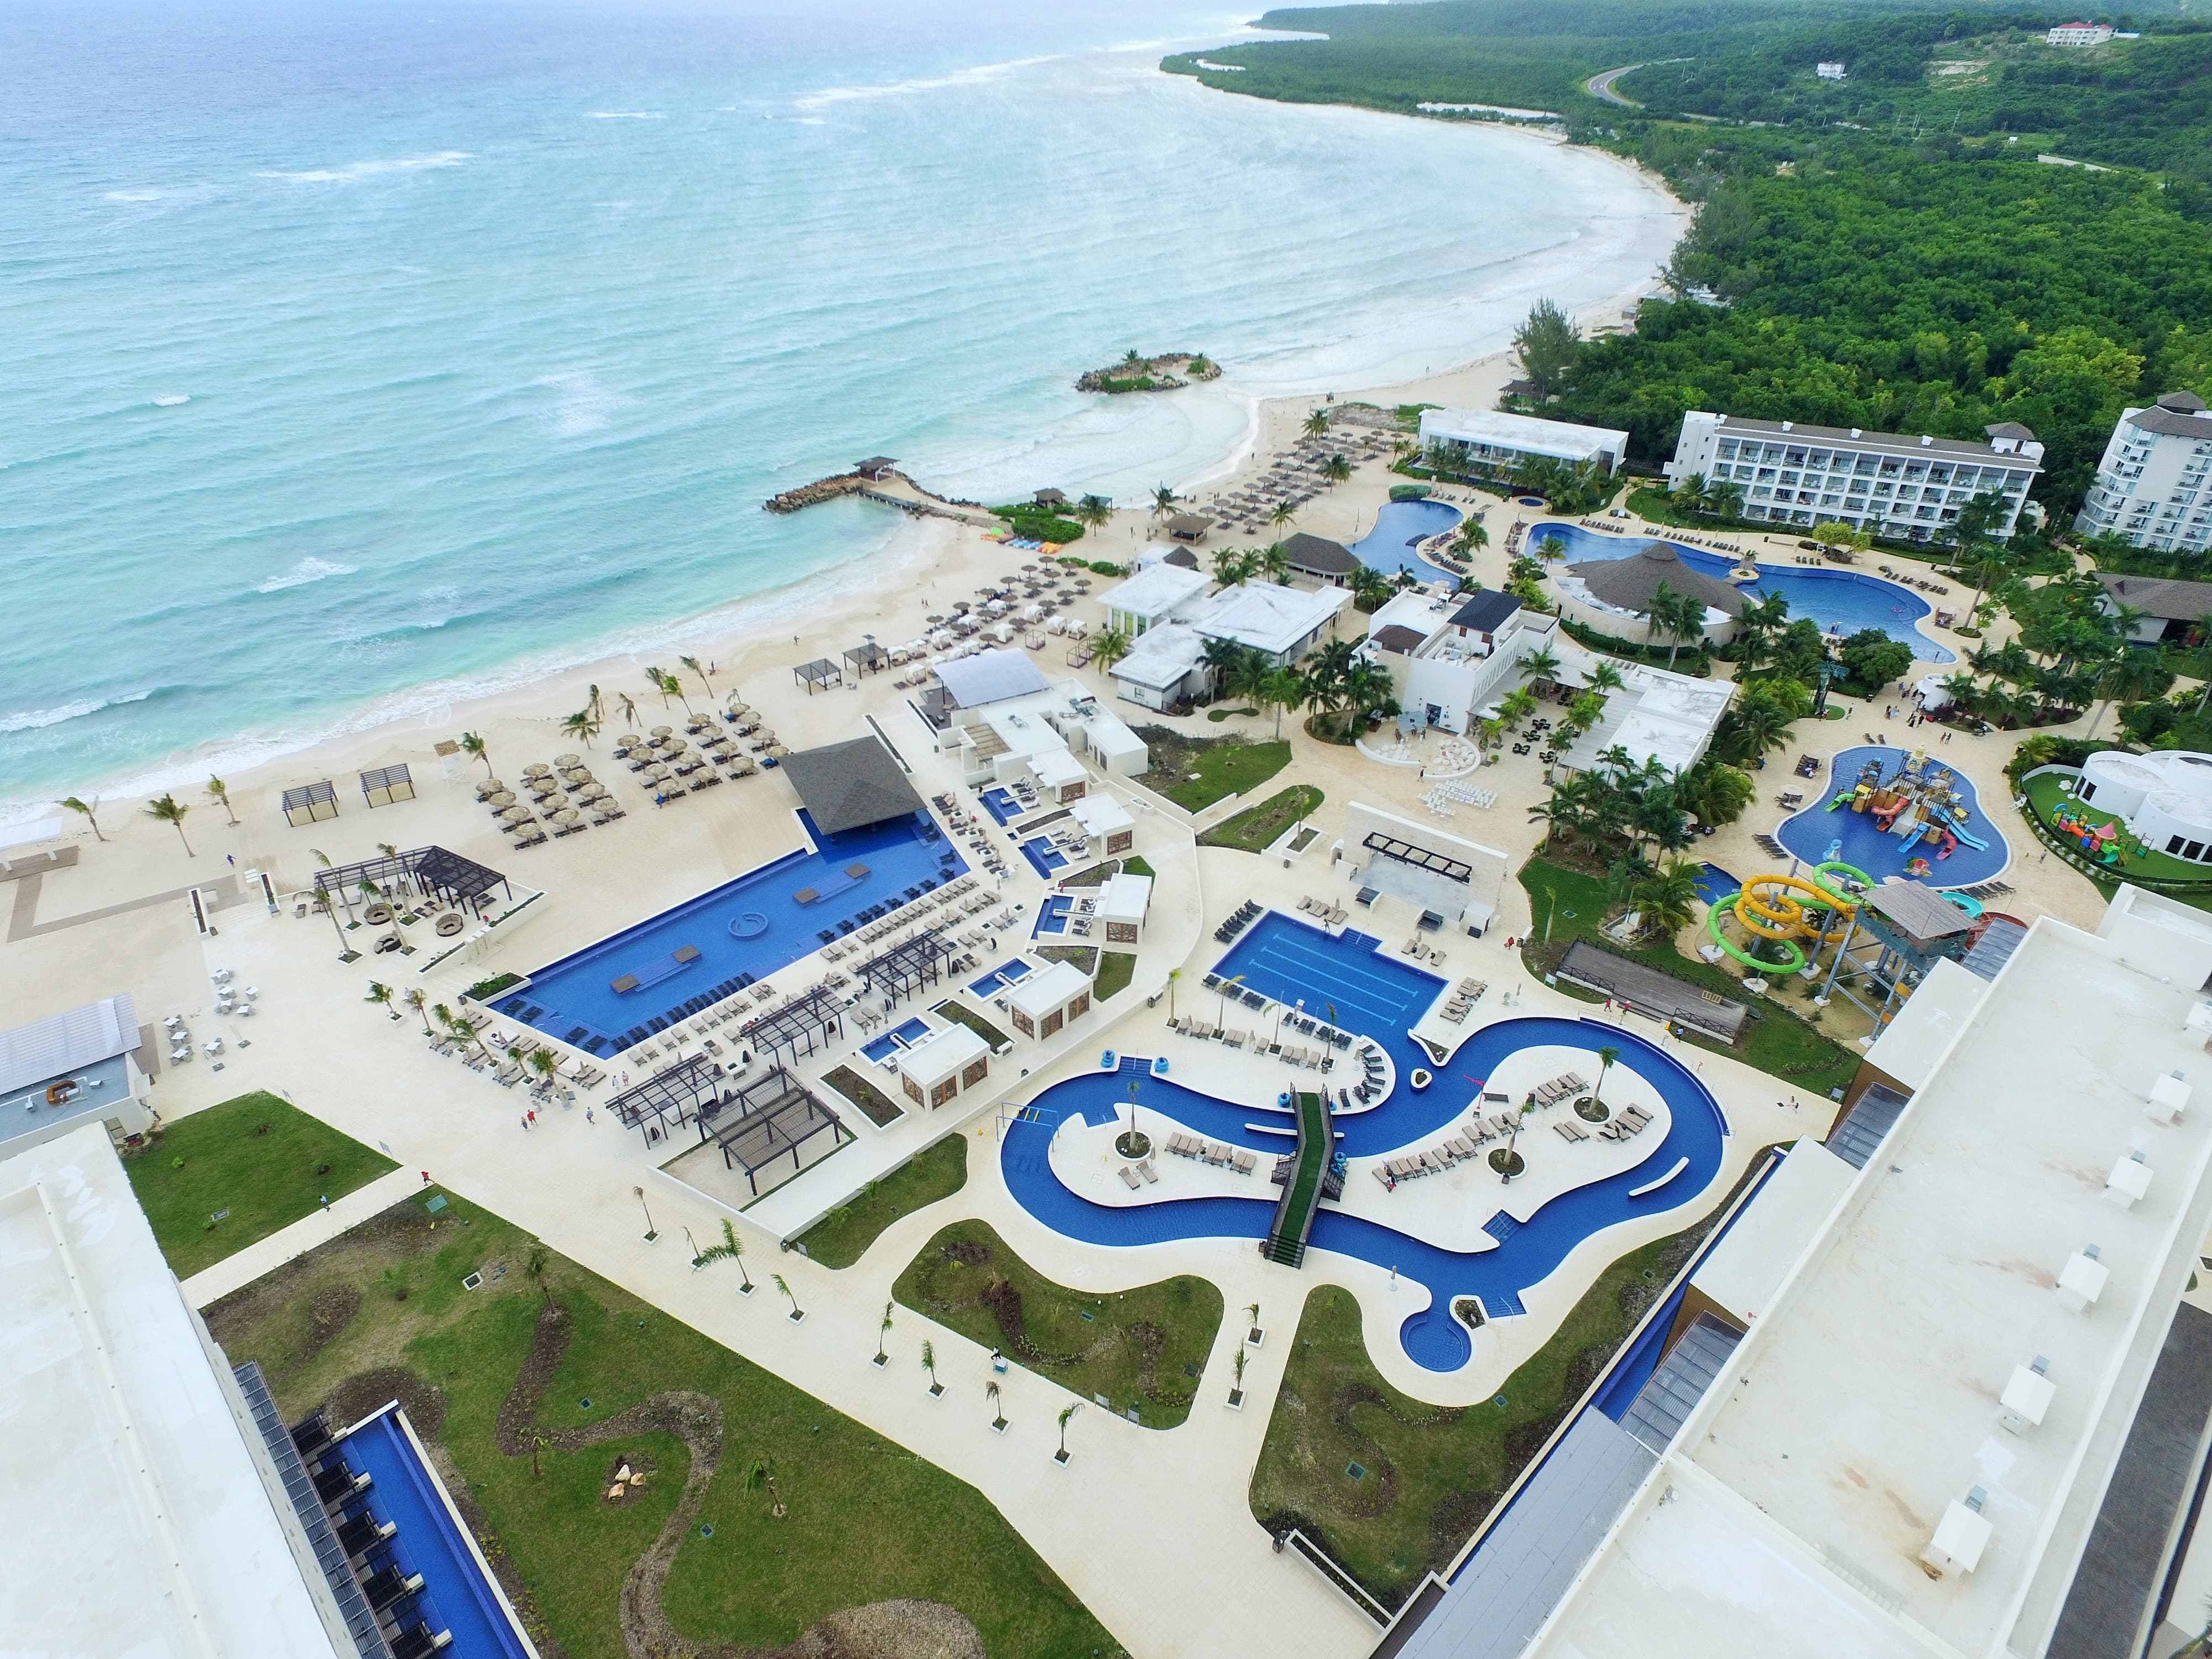 Instalaciones hotel jamaica